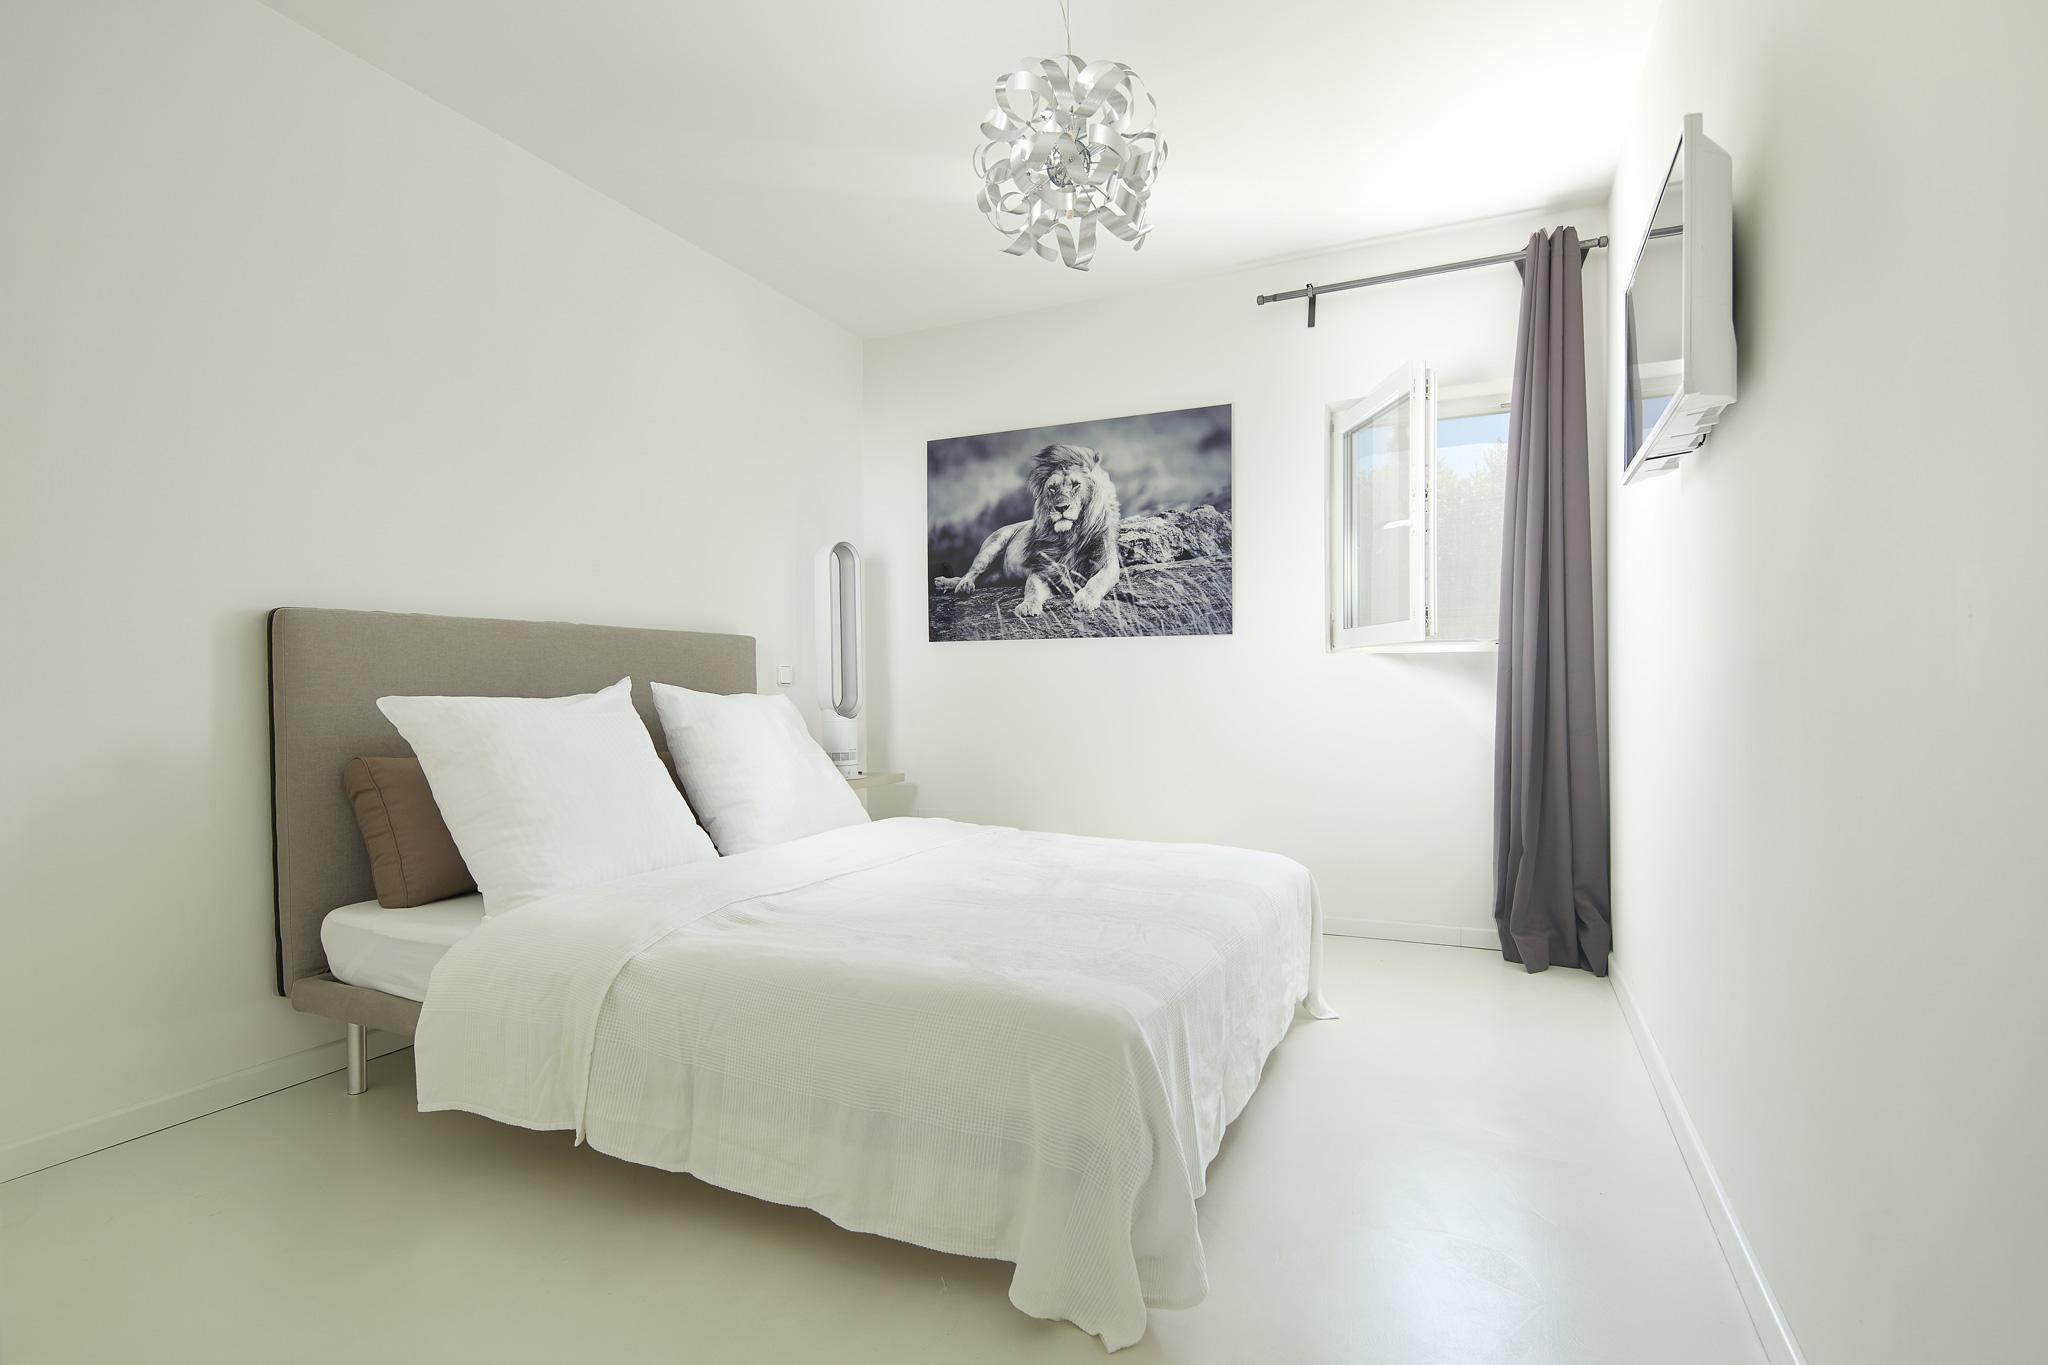 Bedroom_1.1.jpg